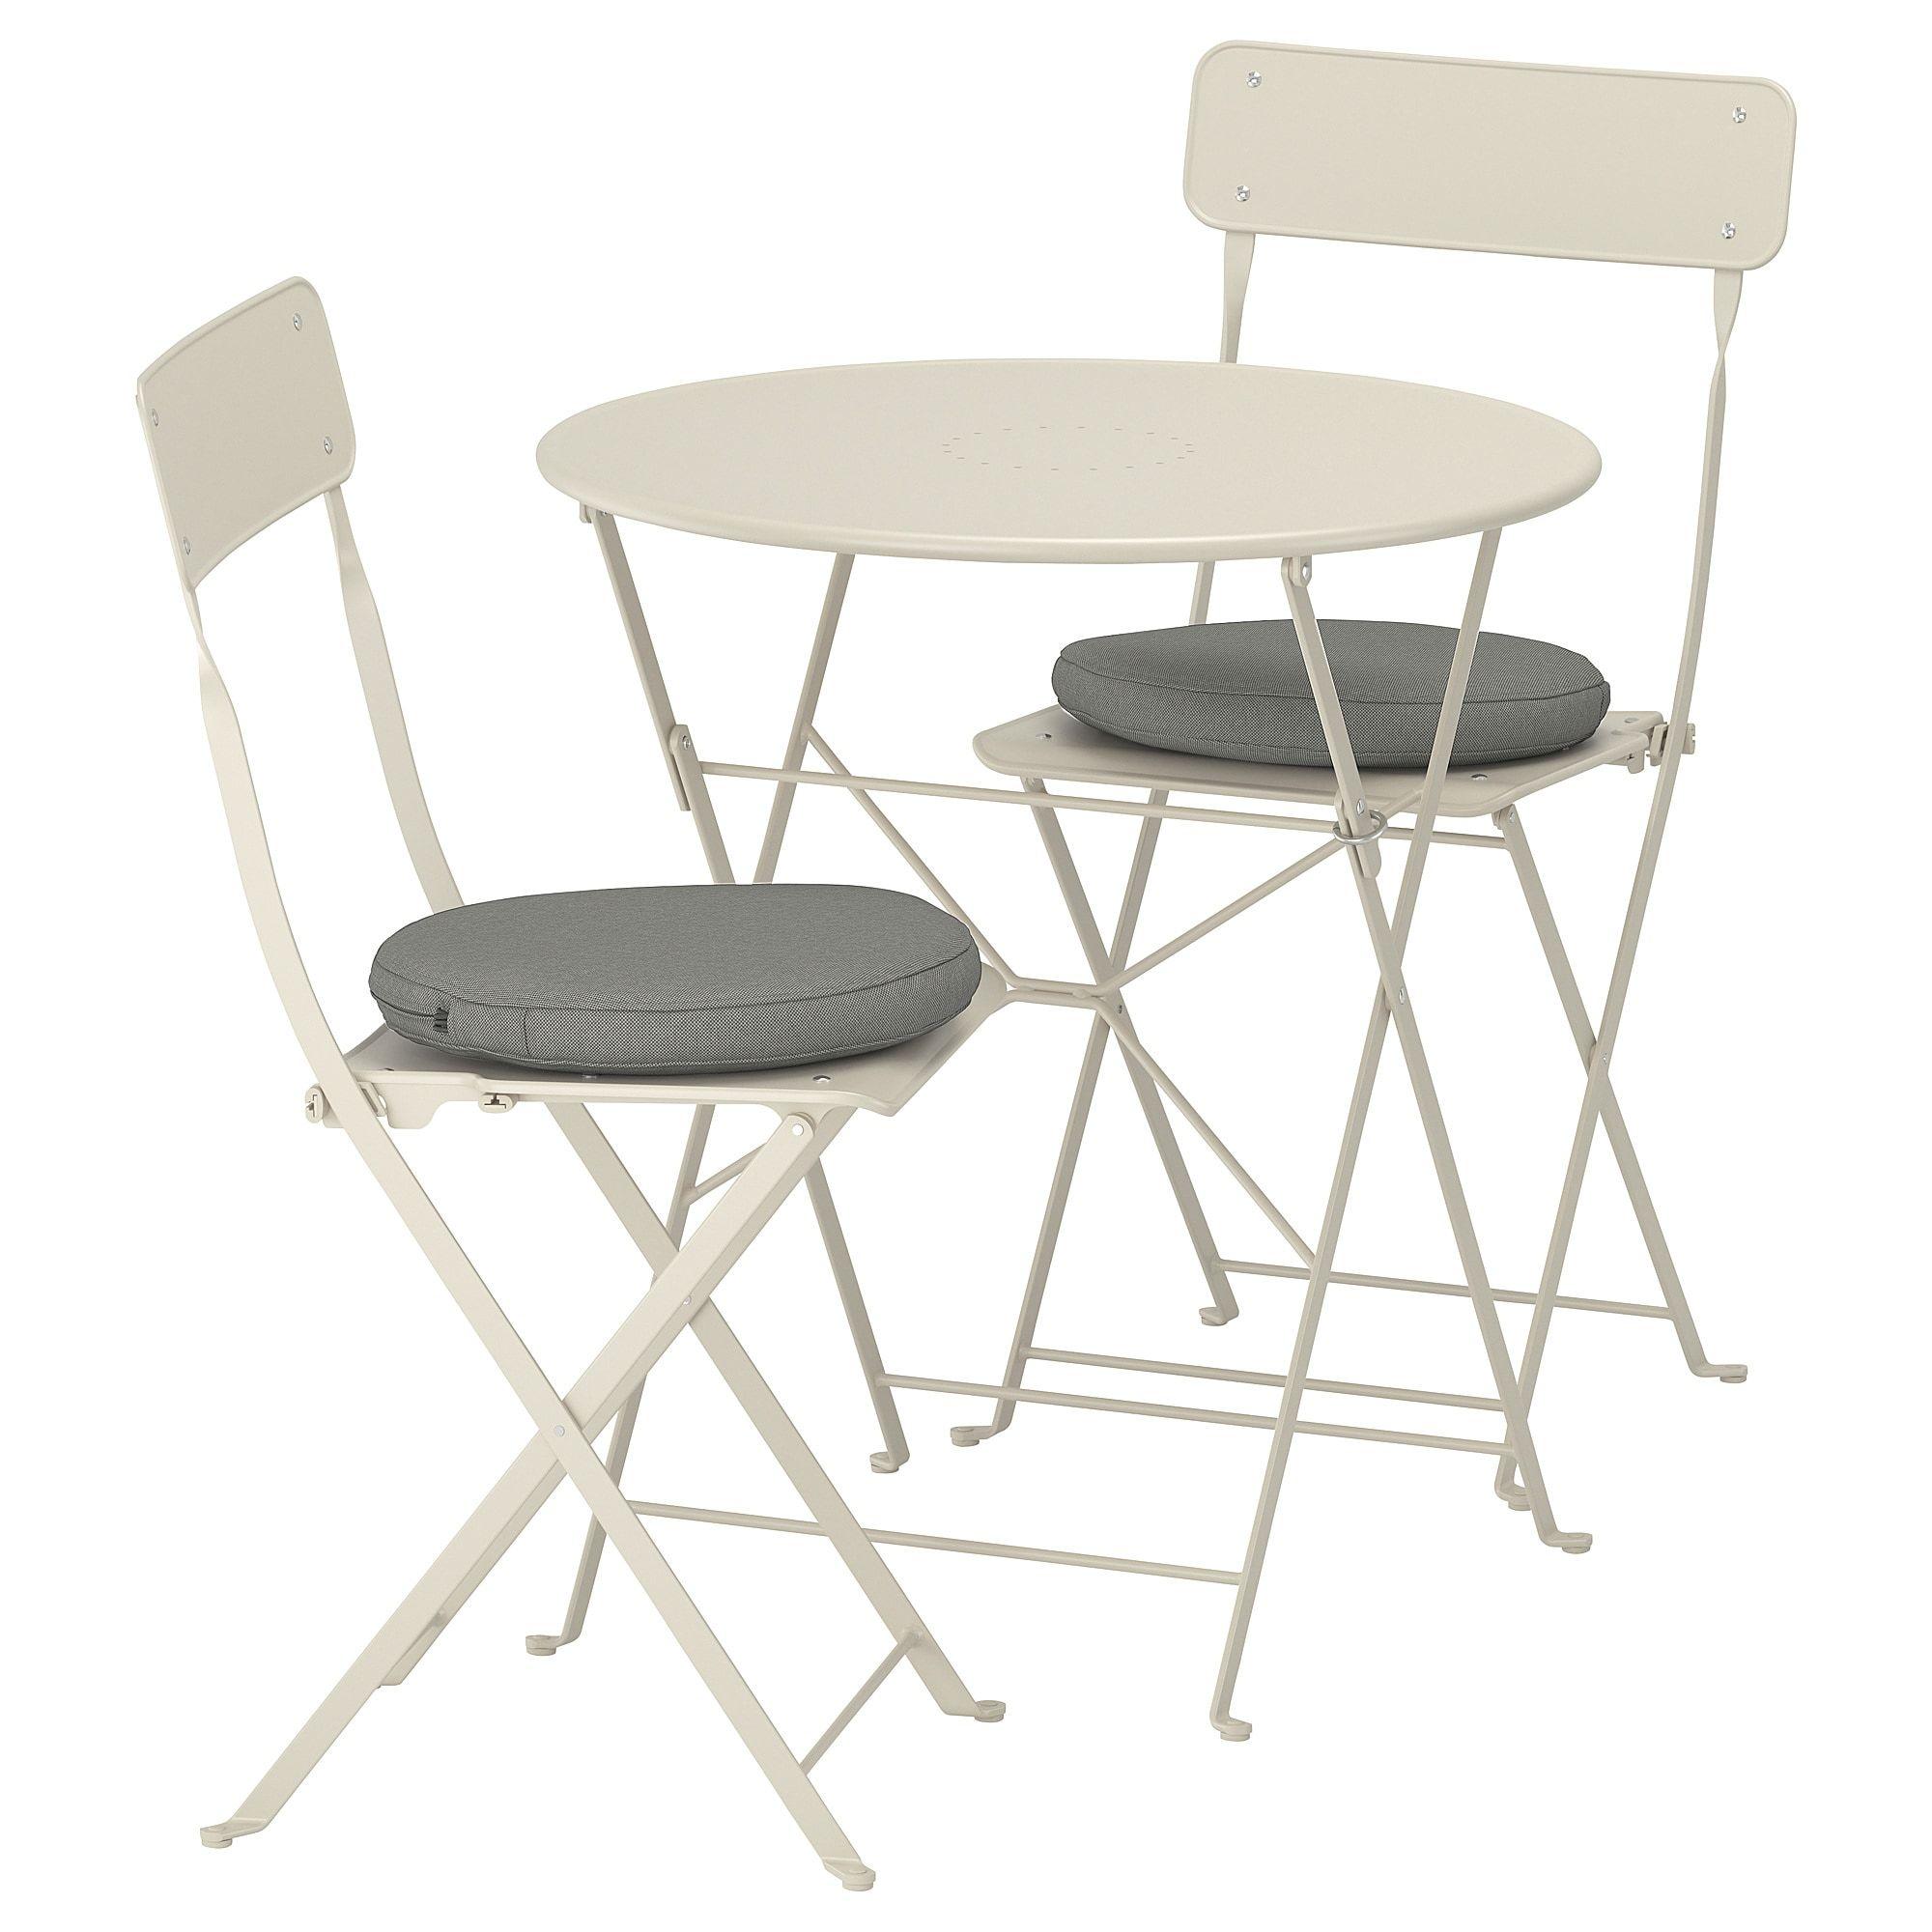 Sedie Pieghevoli Legno Ikea.Saltholmen Tavolo 2 Sedie Pieghevoli Giardino Beige Kuddarna